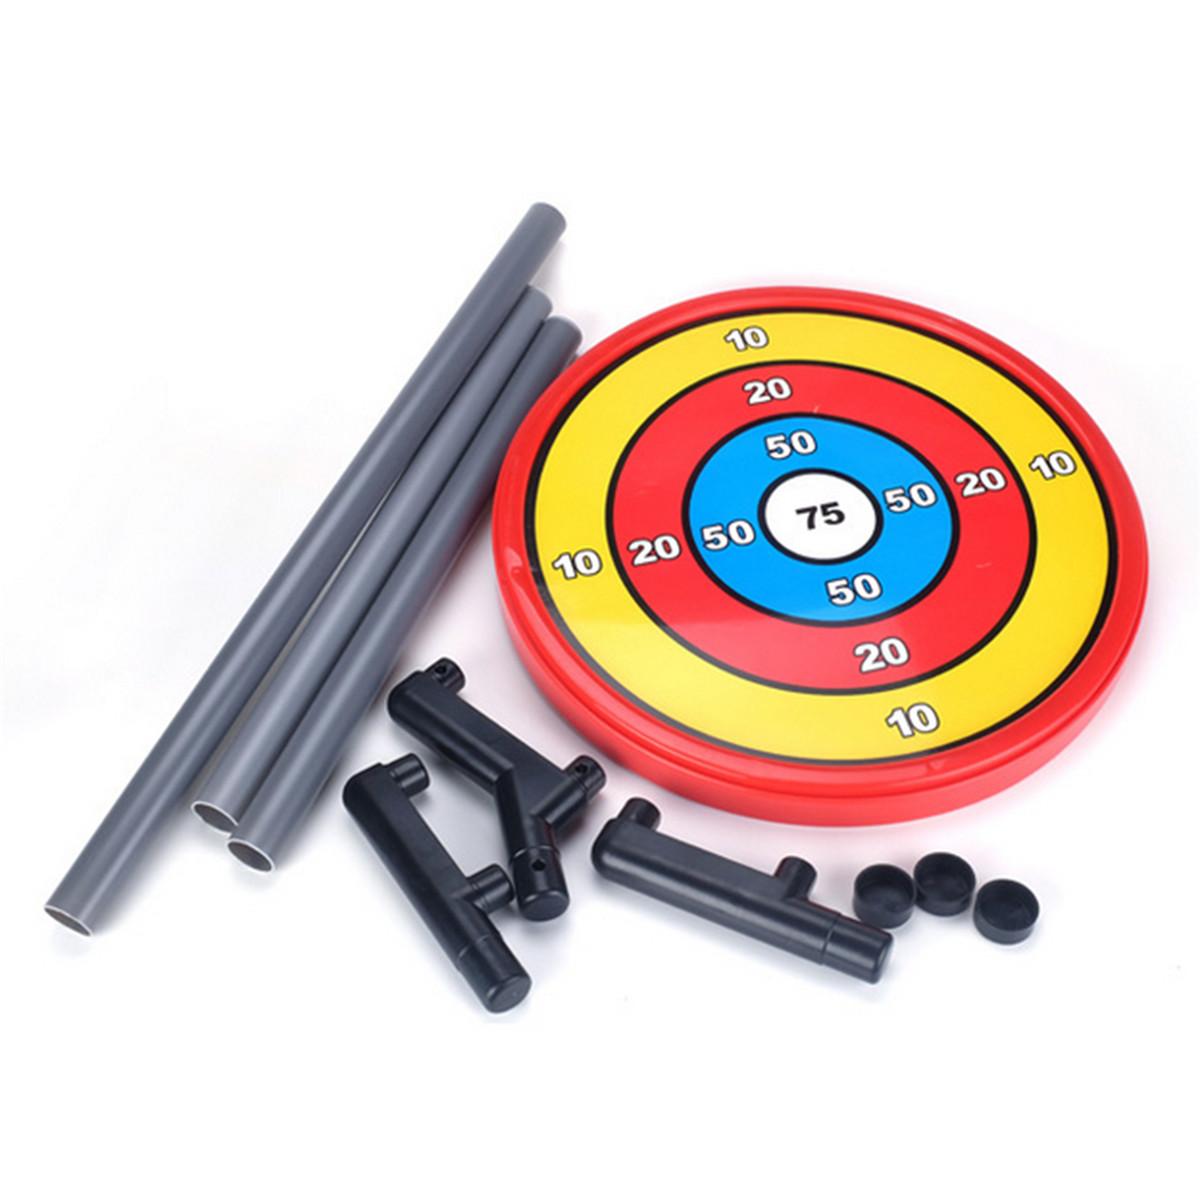 58cm Children Kids Toy Bow & Arrow Archery Target Shooting Set Outdoor Garden Fun Game